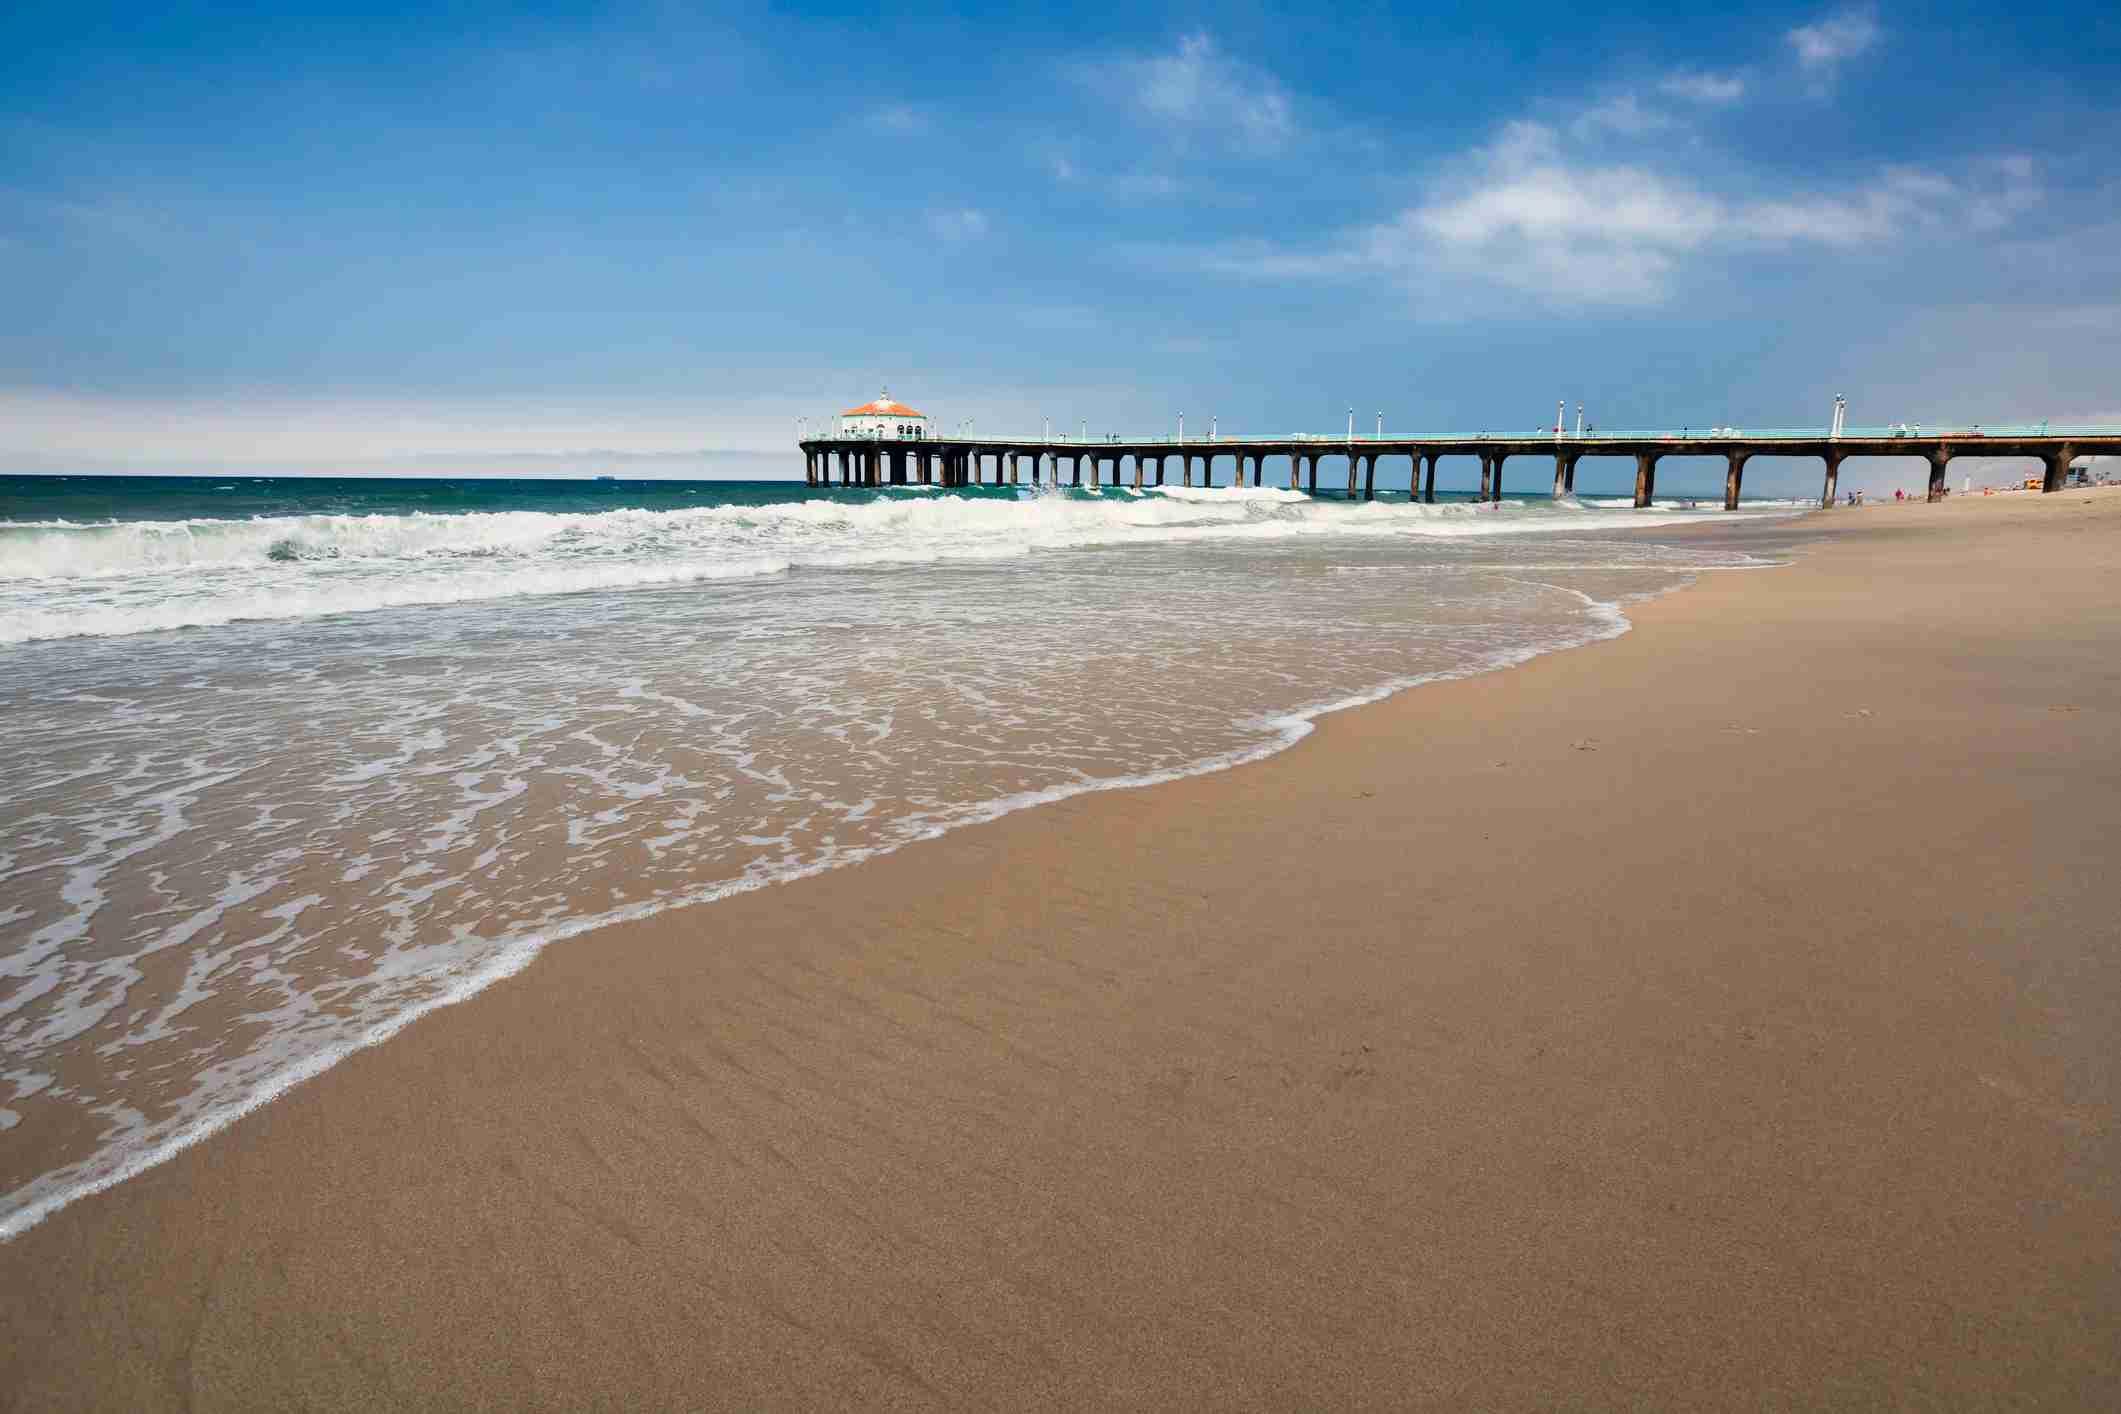 """Manhattan Beach in southern California, pier in the background."""